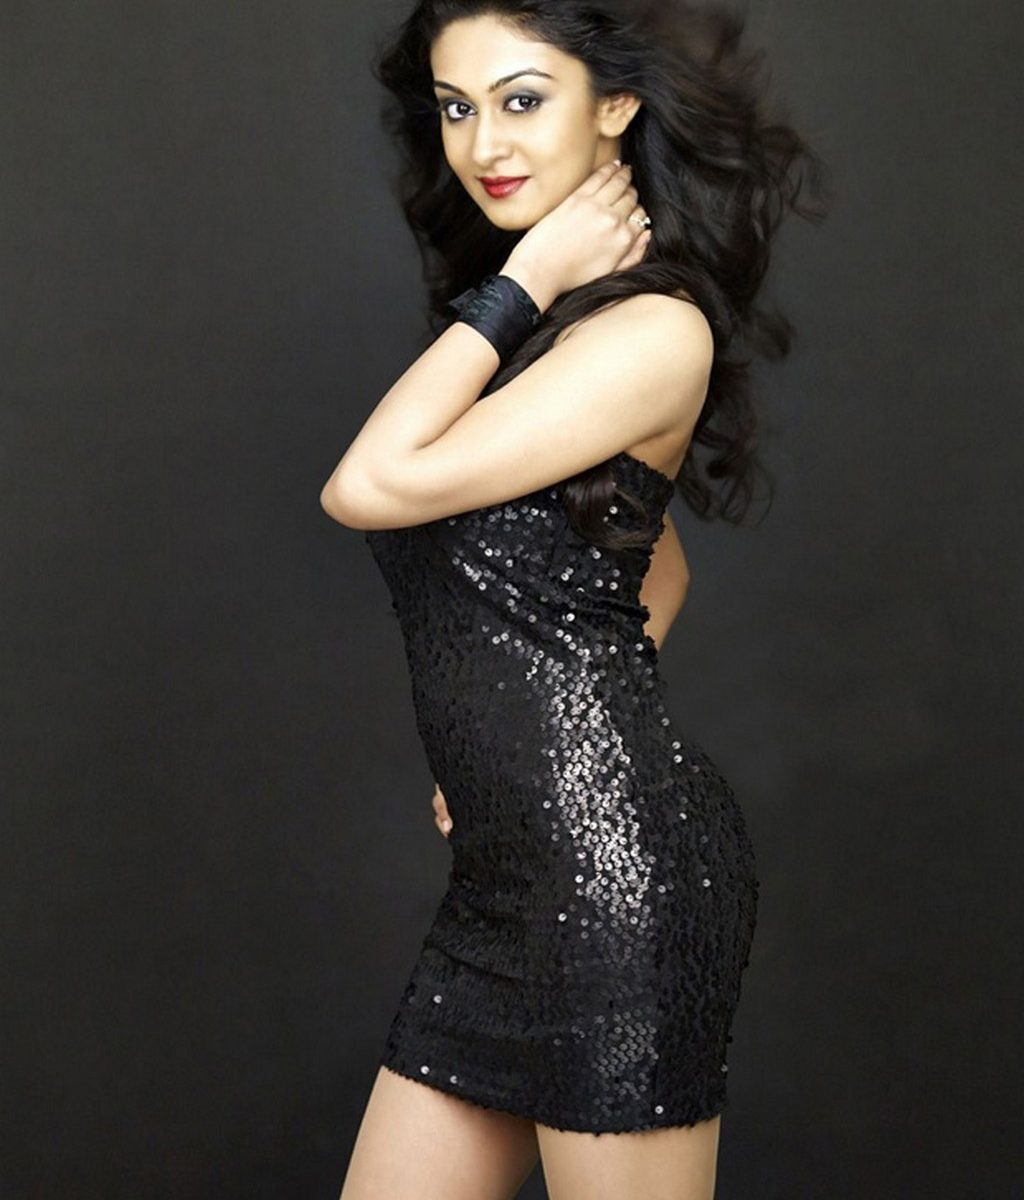 Aishwarya Arjun sexy in black dress